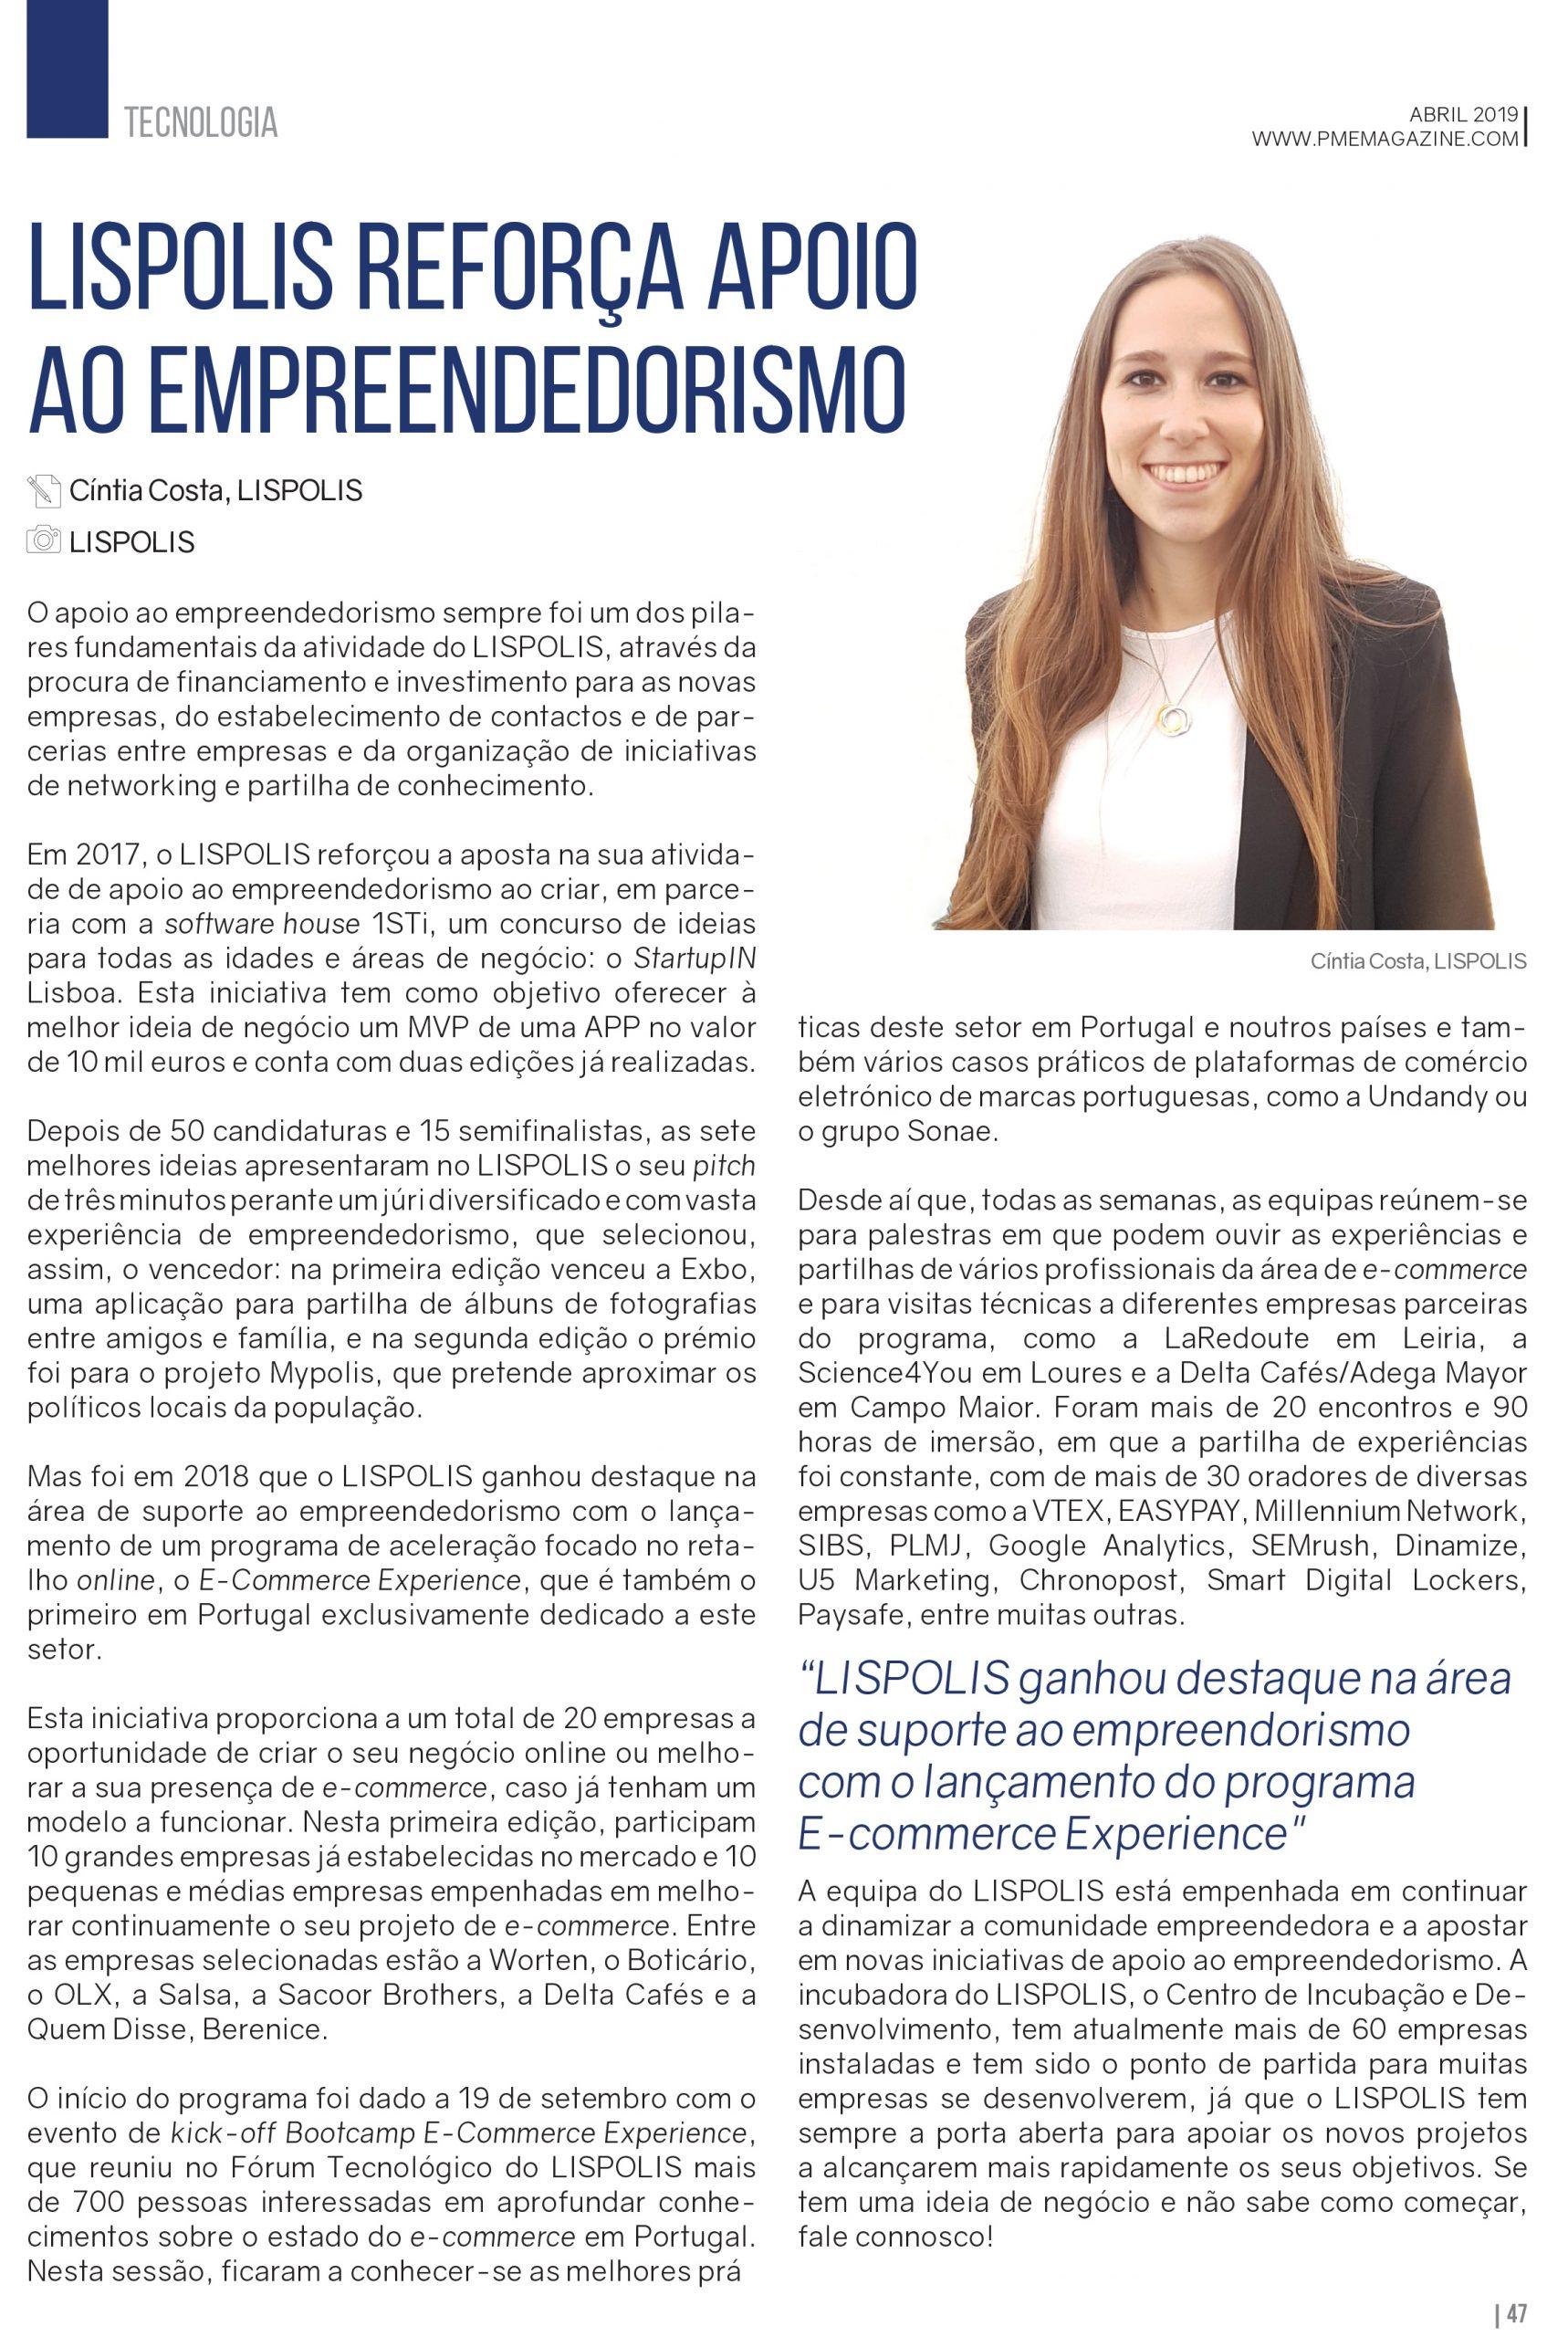 LISPOLIS reforça apoio ao empreendedorismo